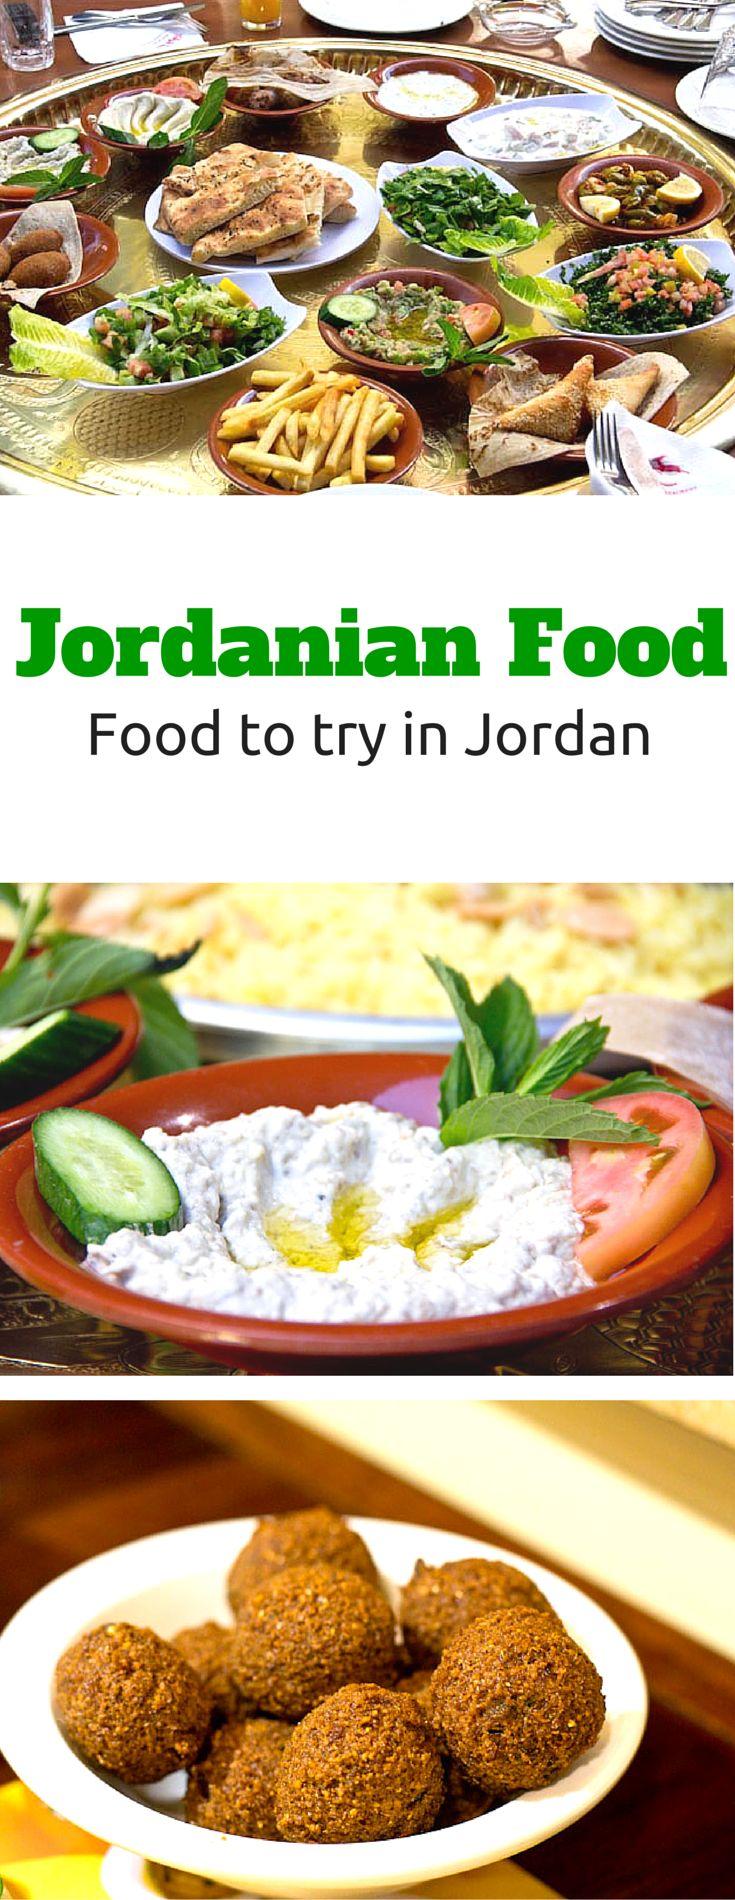 Jordanian Food: The ultimate list of what to eat in Jordan. ~ http://www.baconismagic.ca